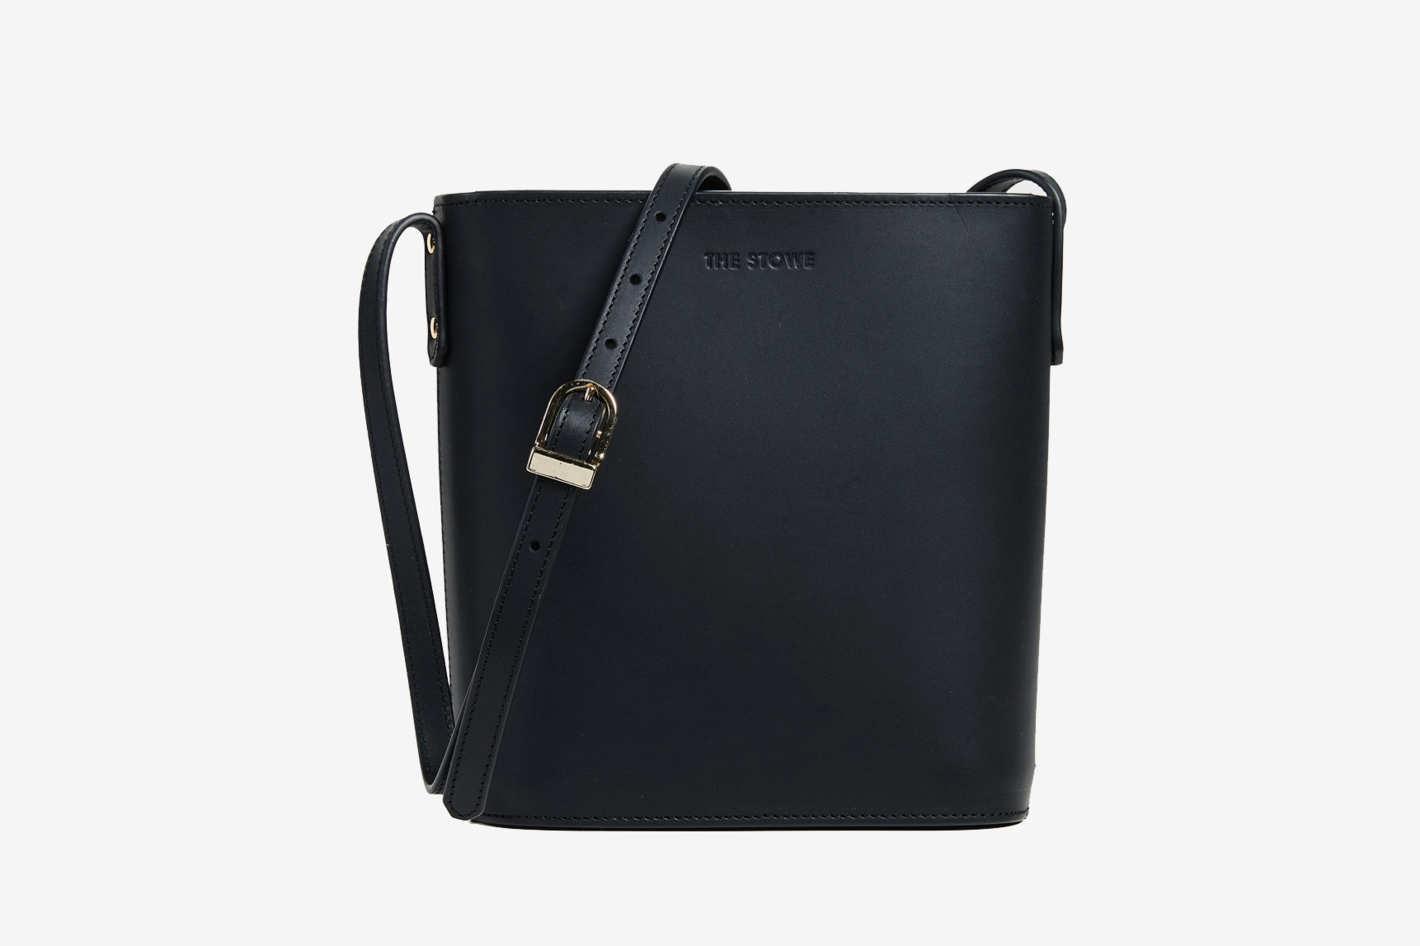 The Stowe Nellie Cross Body Bag